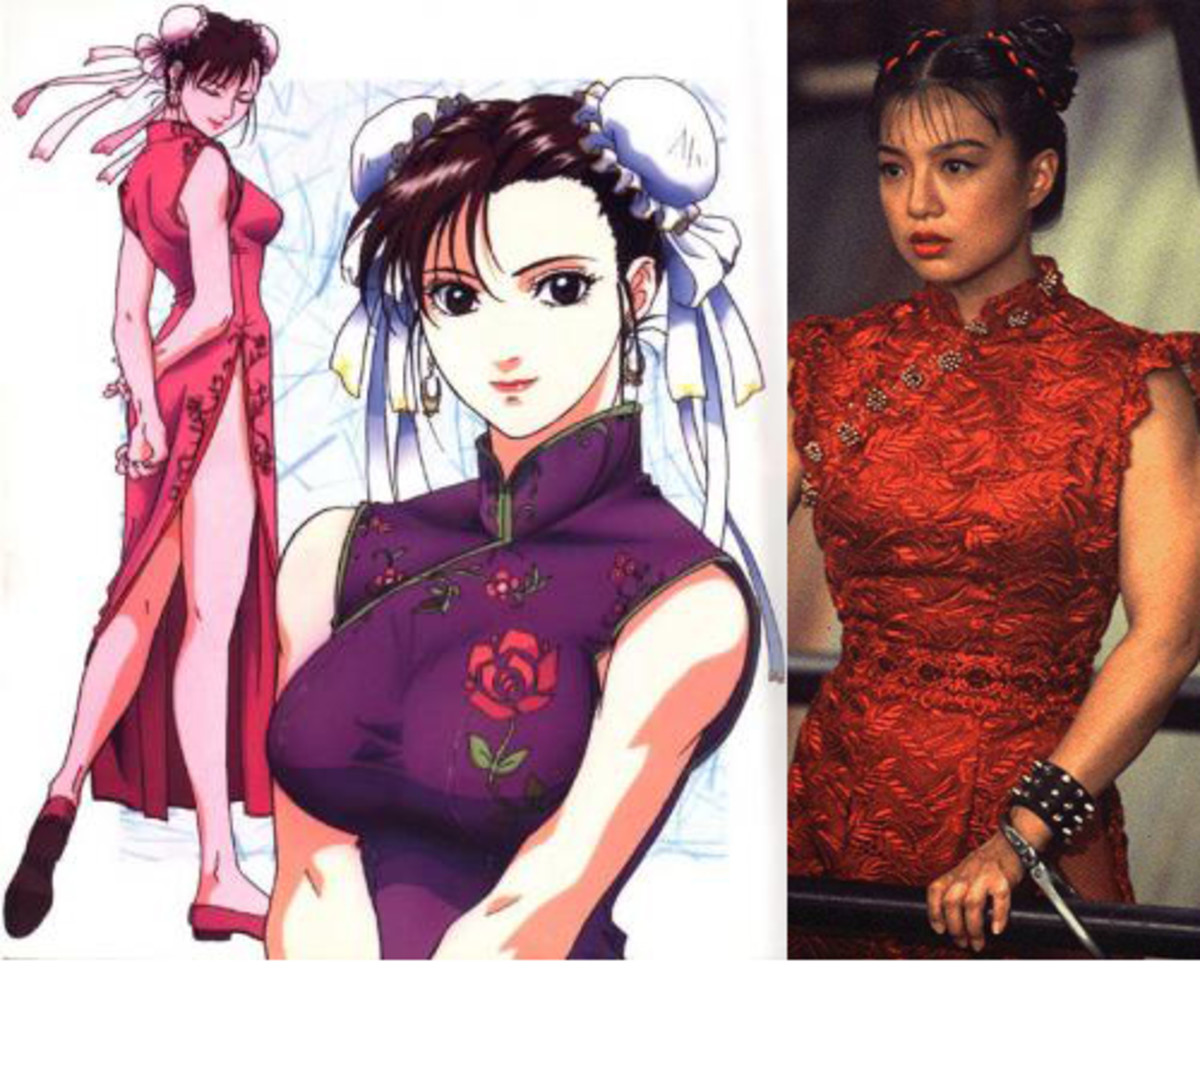 Chun Li, Street Fighter from Capcom, played by Ming Na